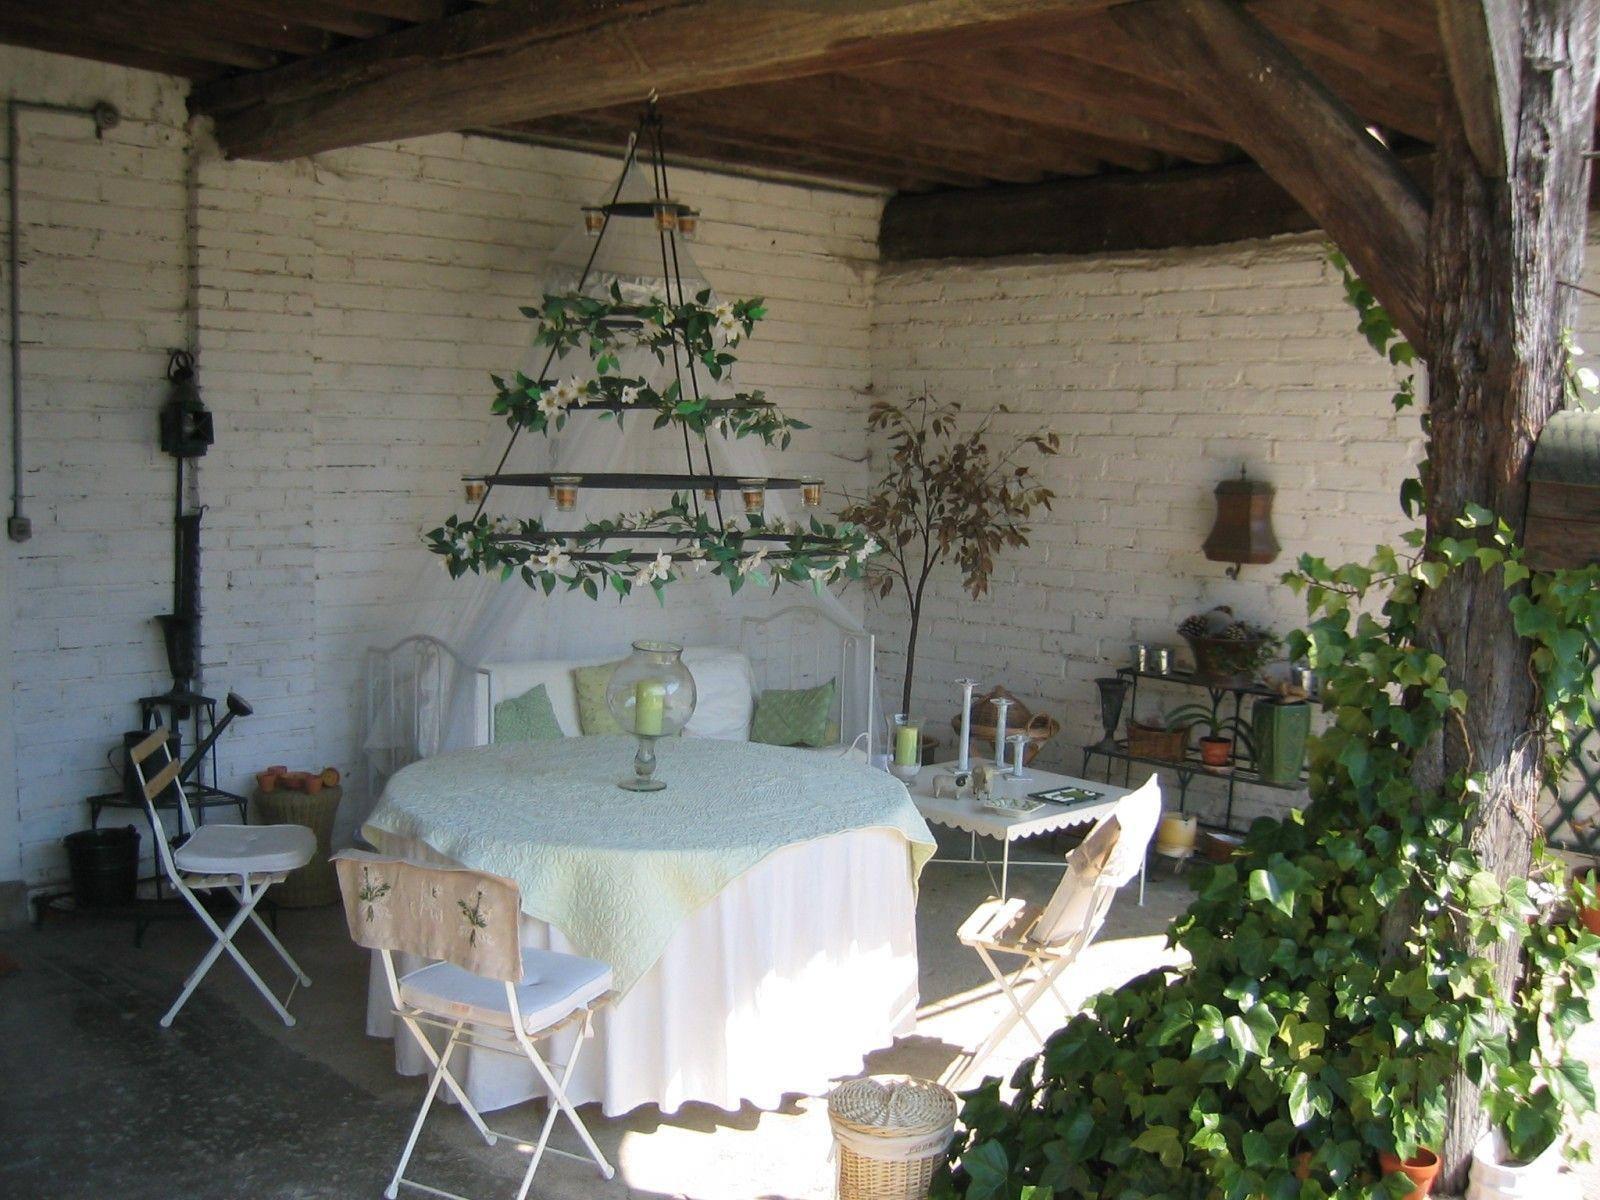 déco terrasse couverte | zaridaina | Pinterest | Deco terrasse ...